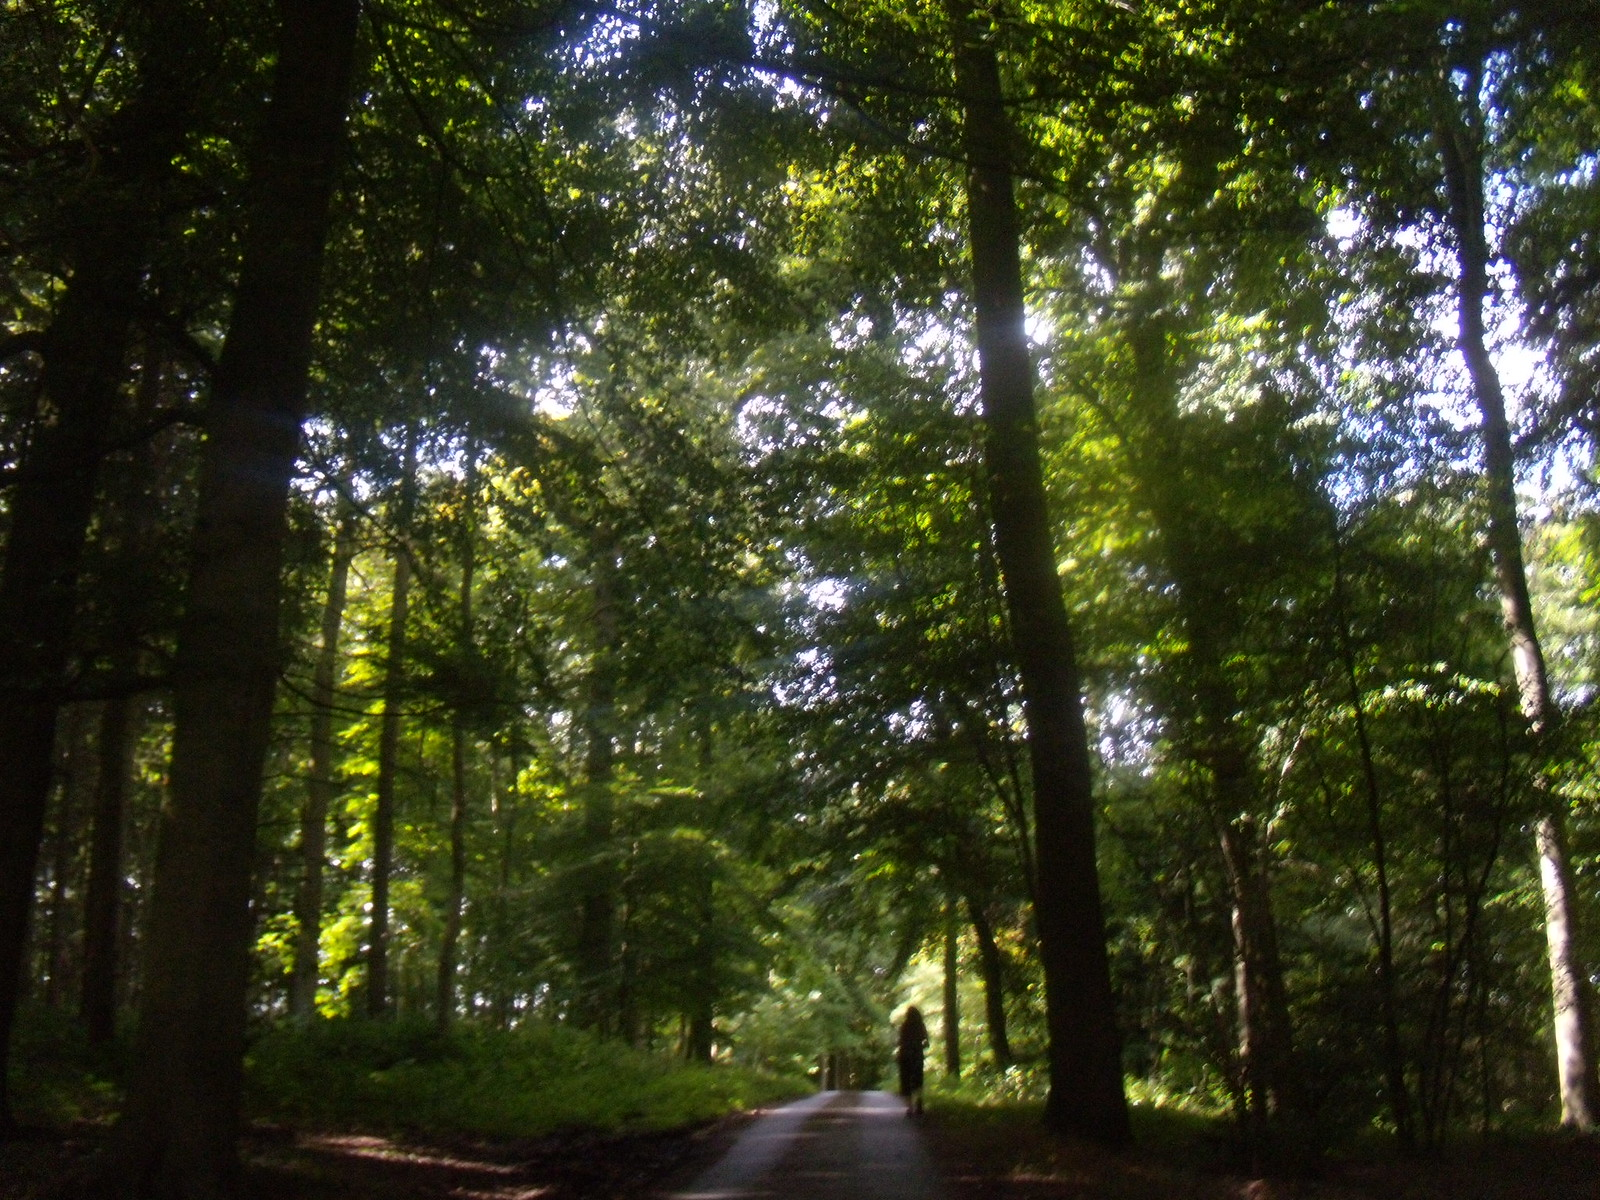 Tall trees, Cosgrove Woods Wendover Circular